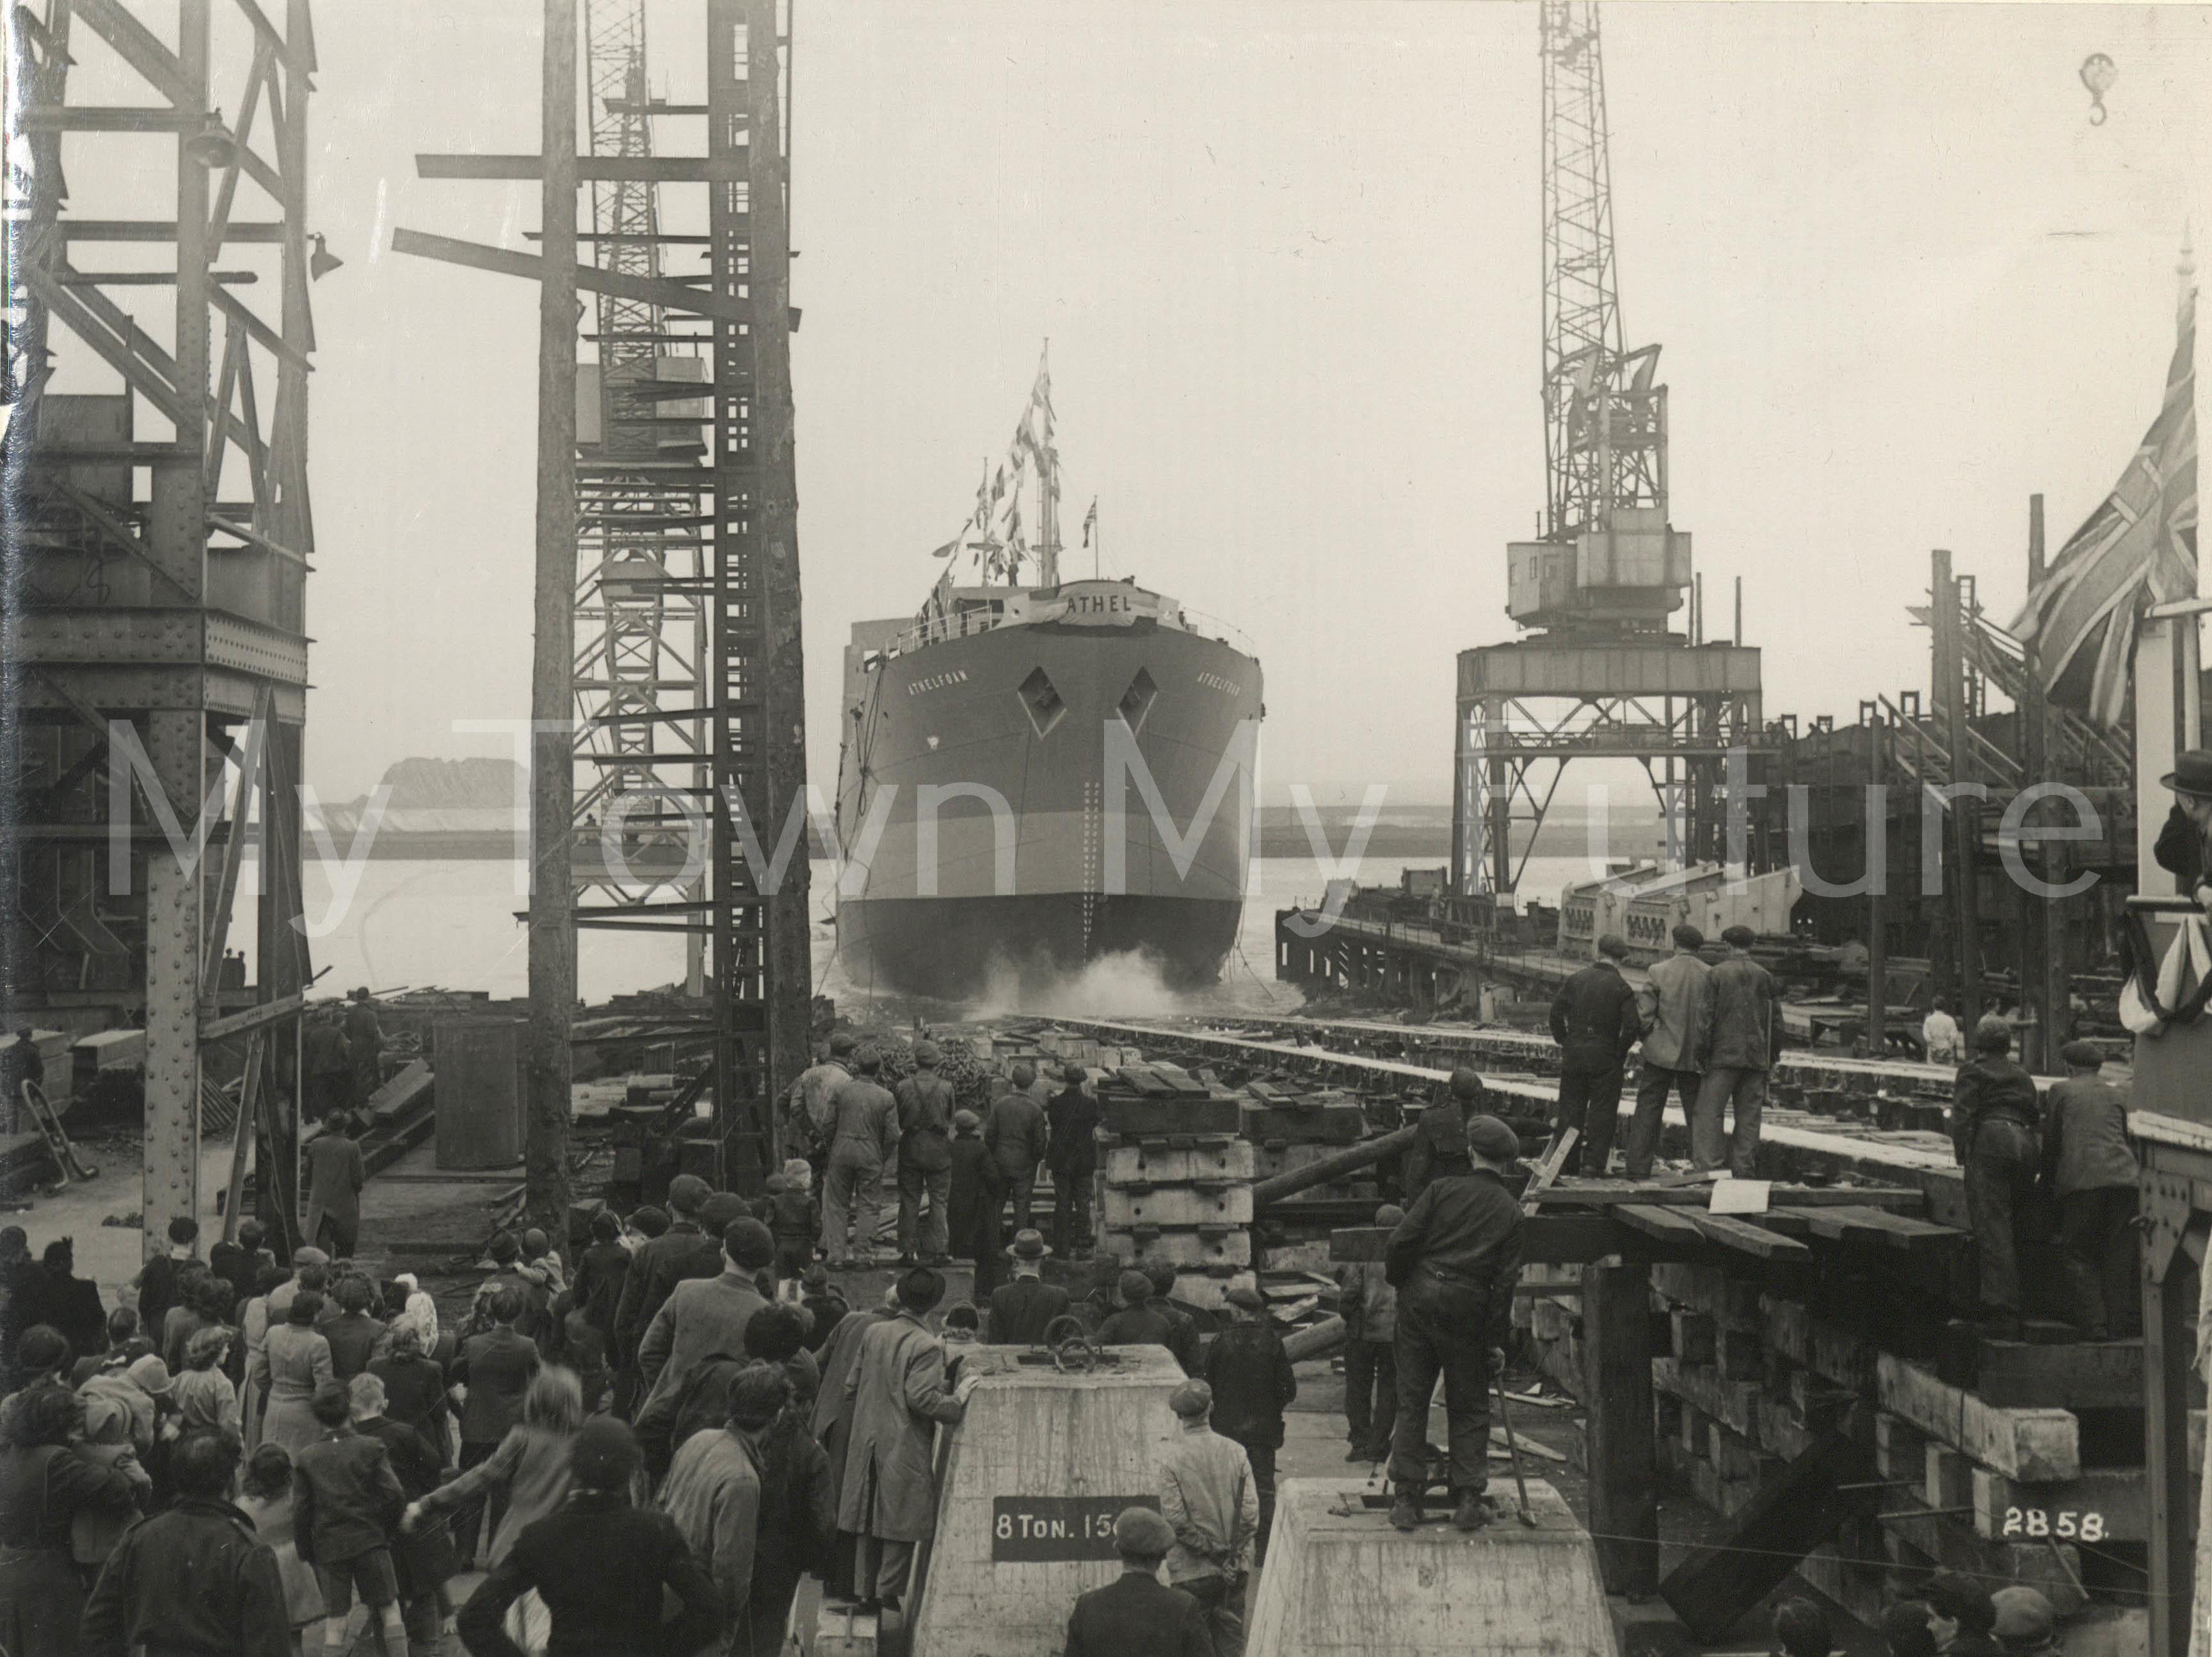 Smith's Dock Ships - Athelfoam Launch